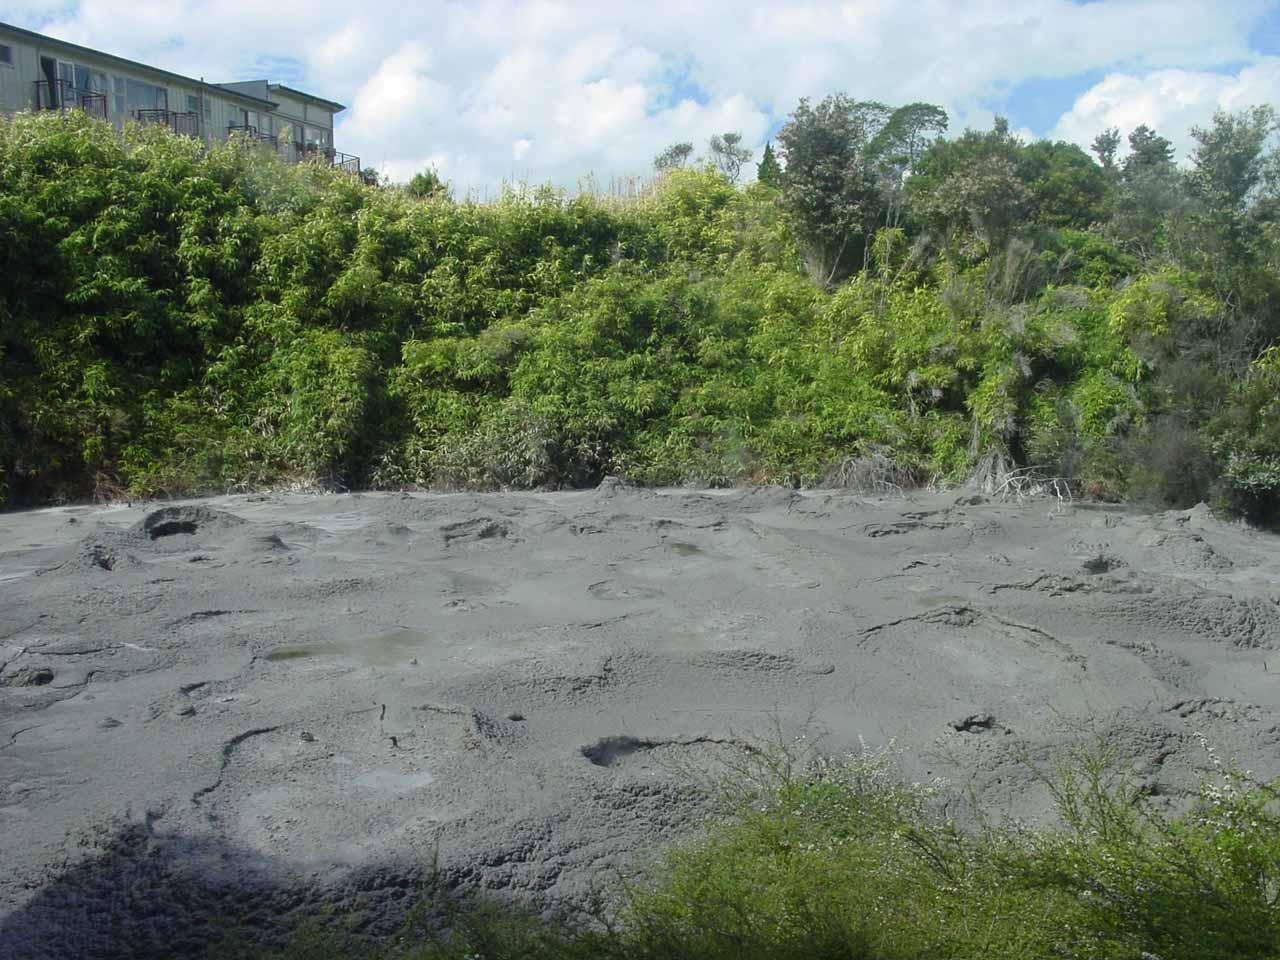 Looking across some mud pots at Te Whakarewarewa